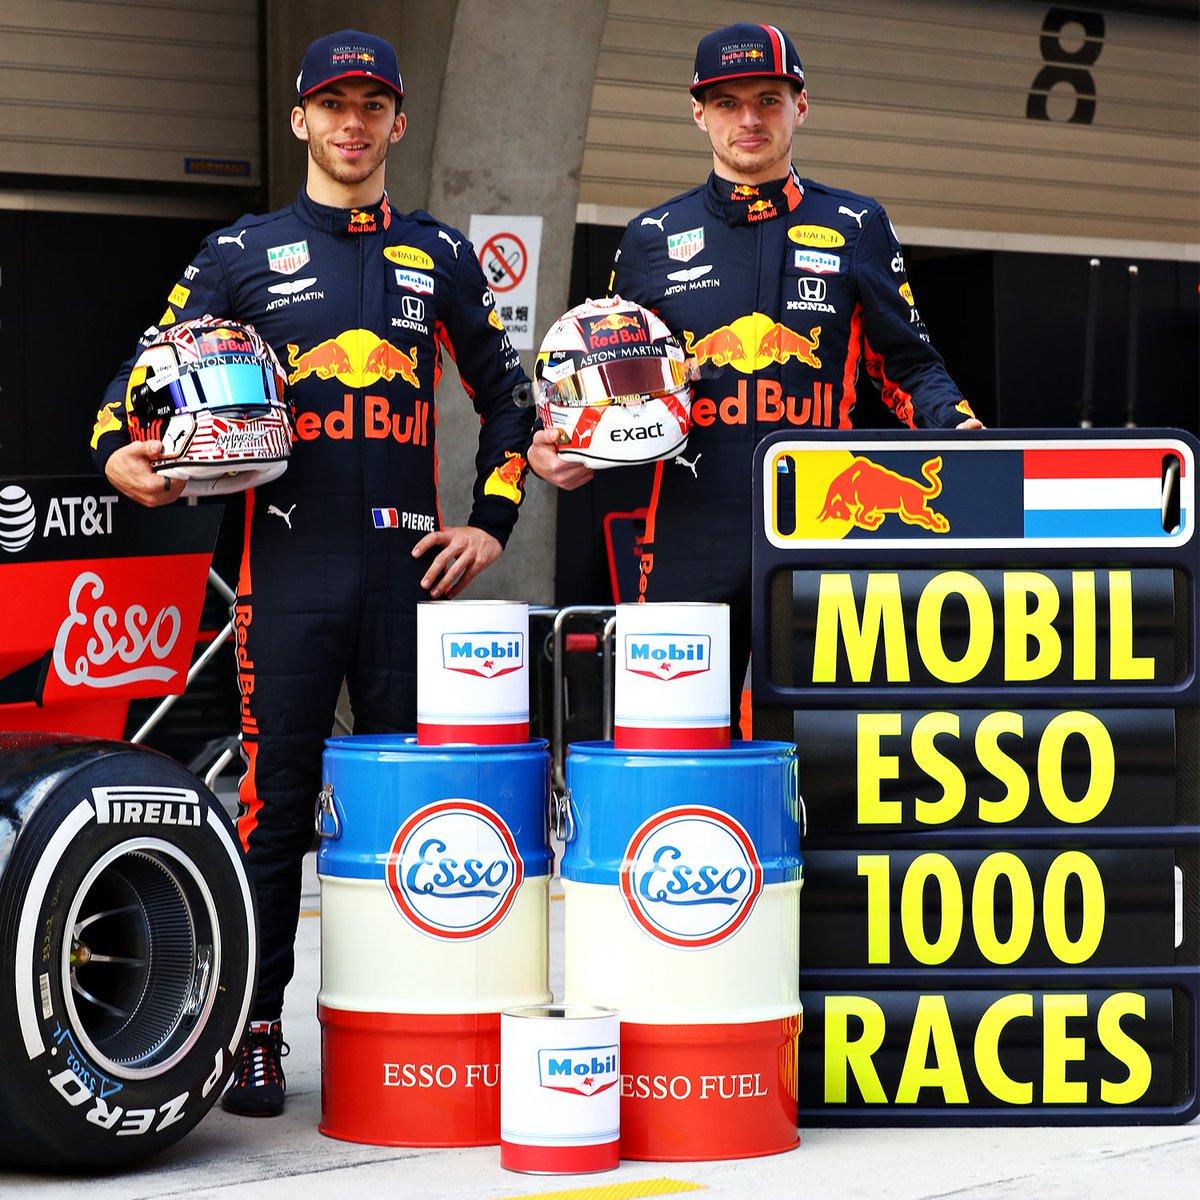 Aston Martin F1: 2019 Aston Martin Red Bull Racing